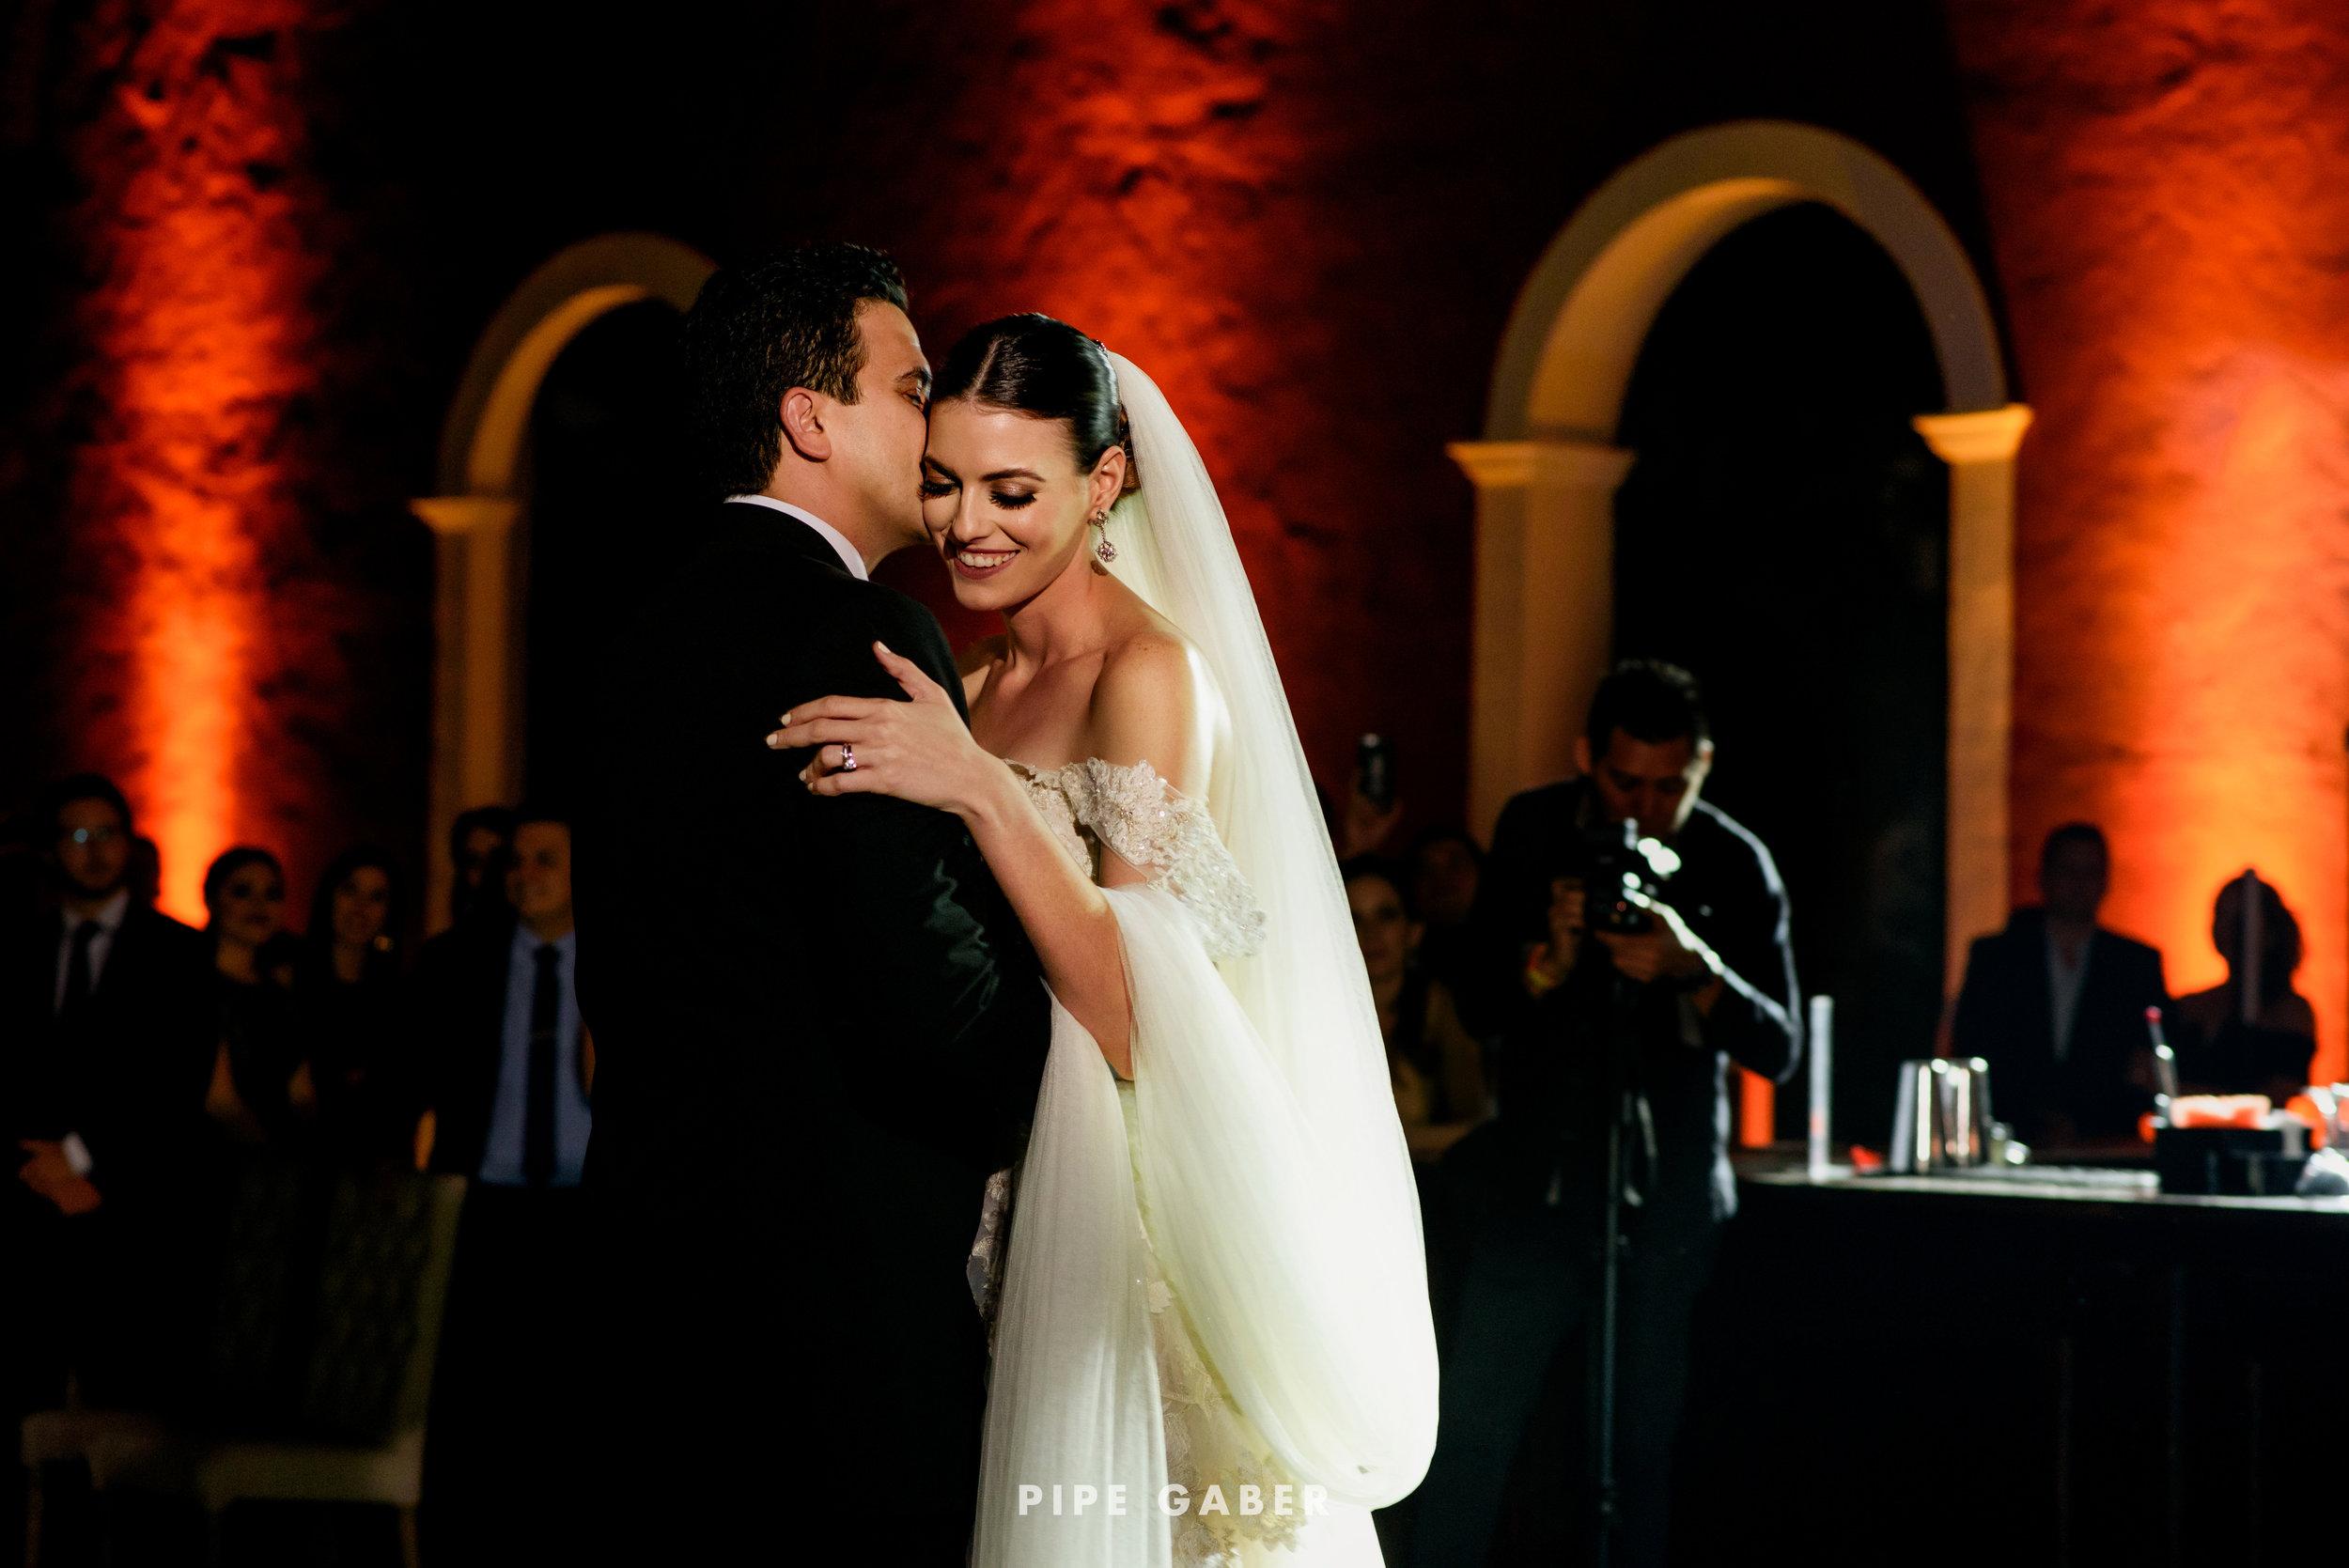 18_02_03_WEDDING_ALEXIS_ABIMERHI_ERICK_APT_2588.jpg